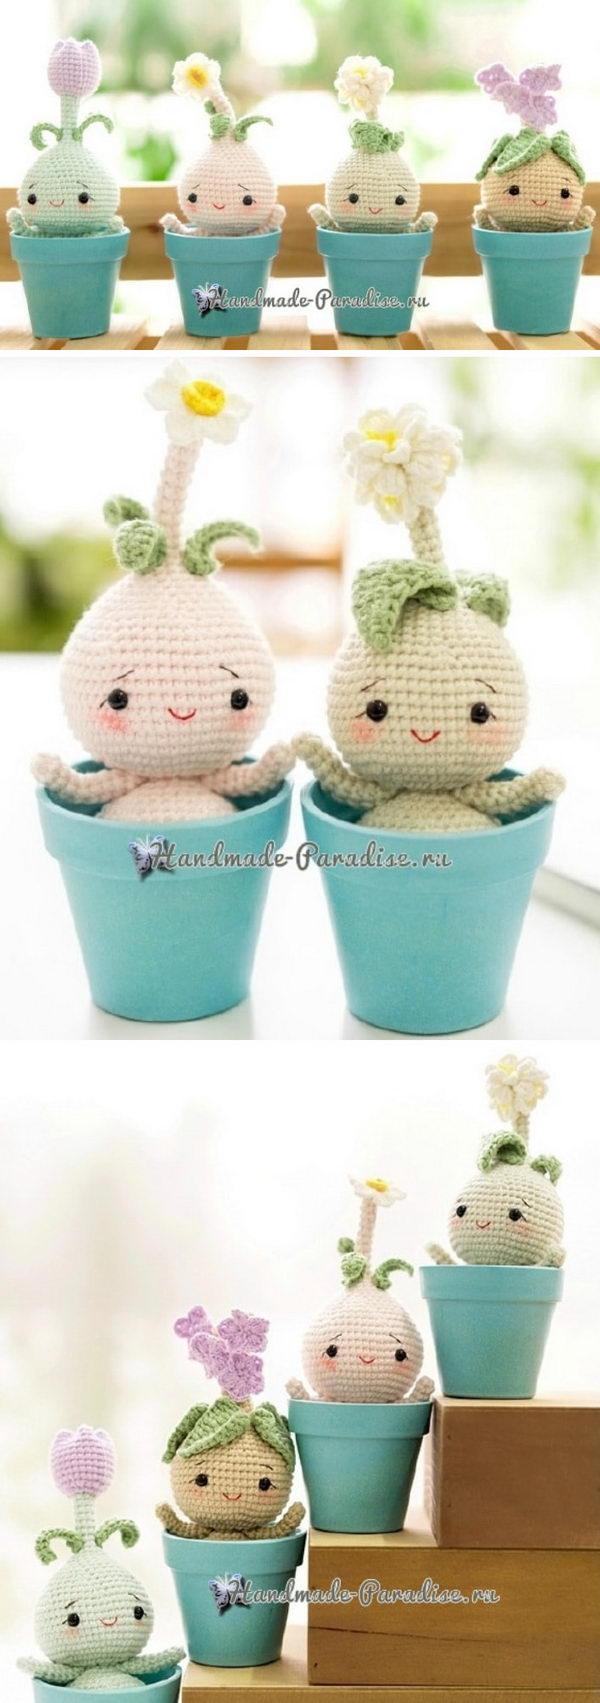 Crochet Baby Flower Plant Bulb Dolls.